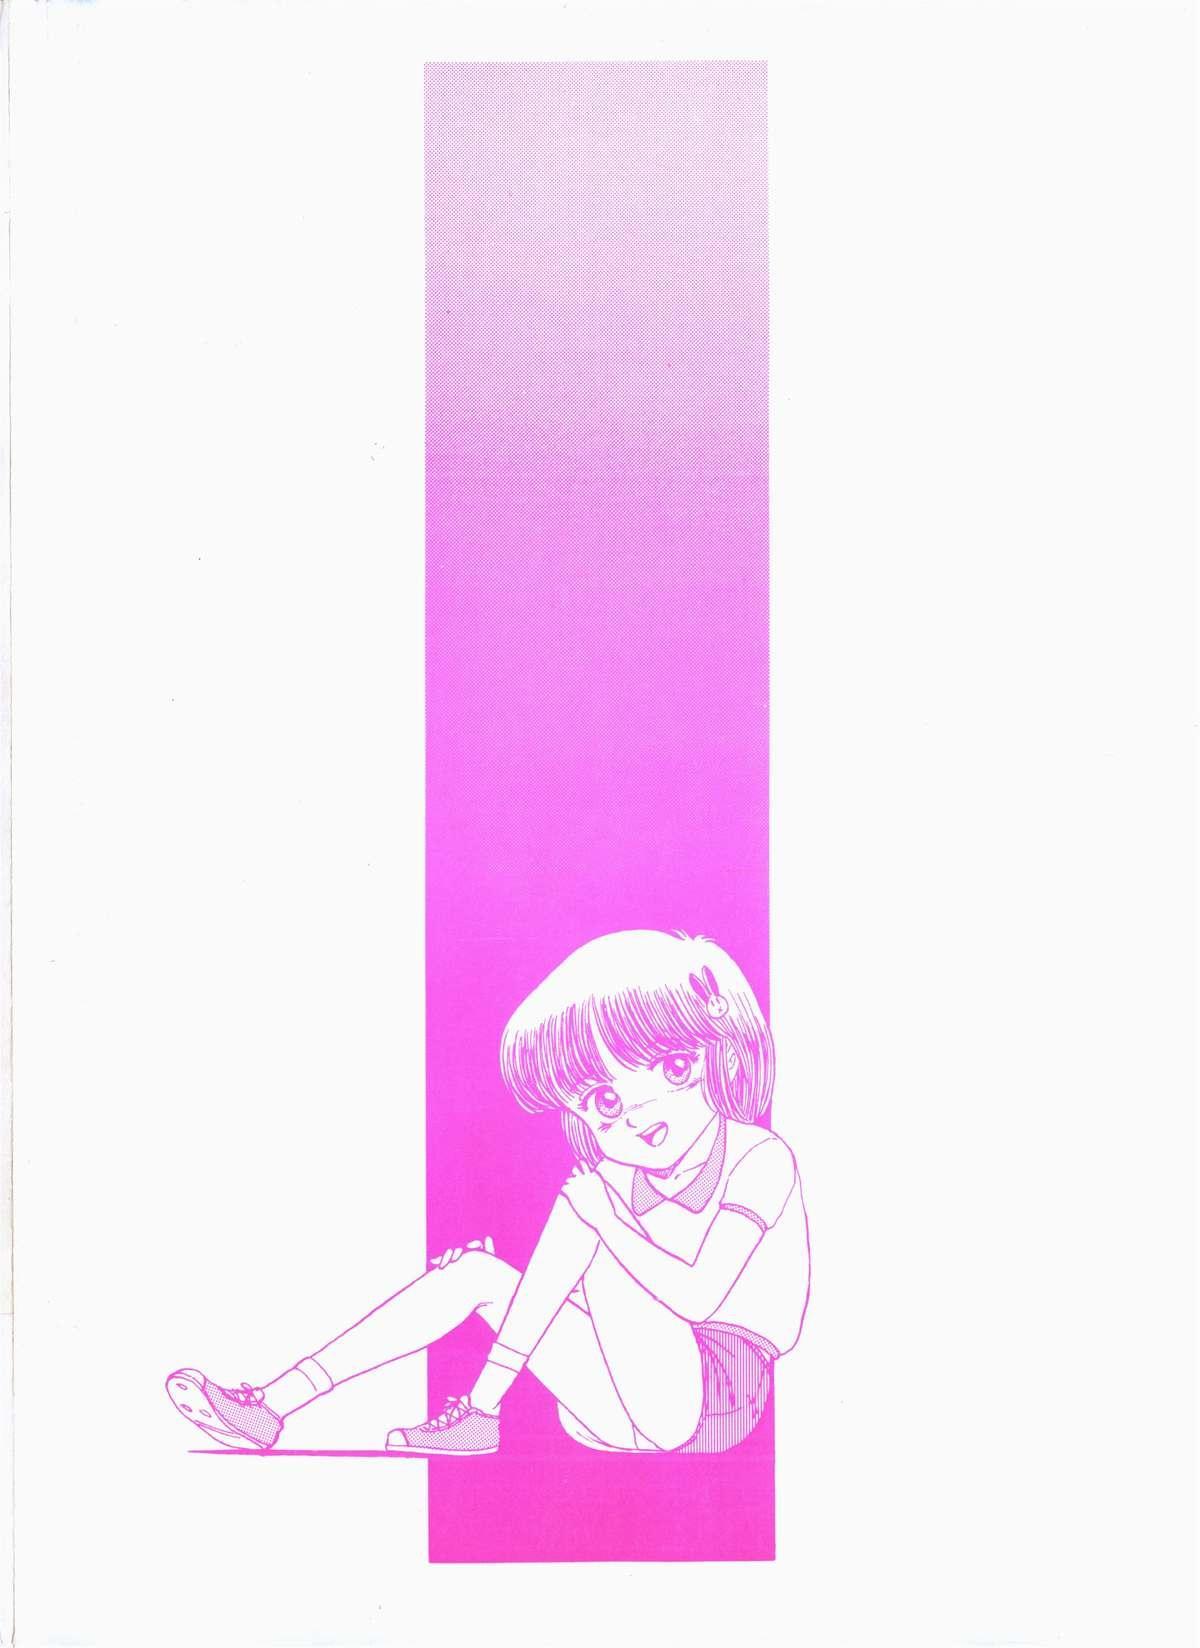 [Secret Society Chi (Iijima Mario)] Kai II - Iijima Mario Kojin-shi - (Various) 52